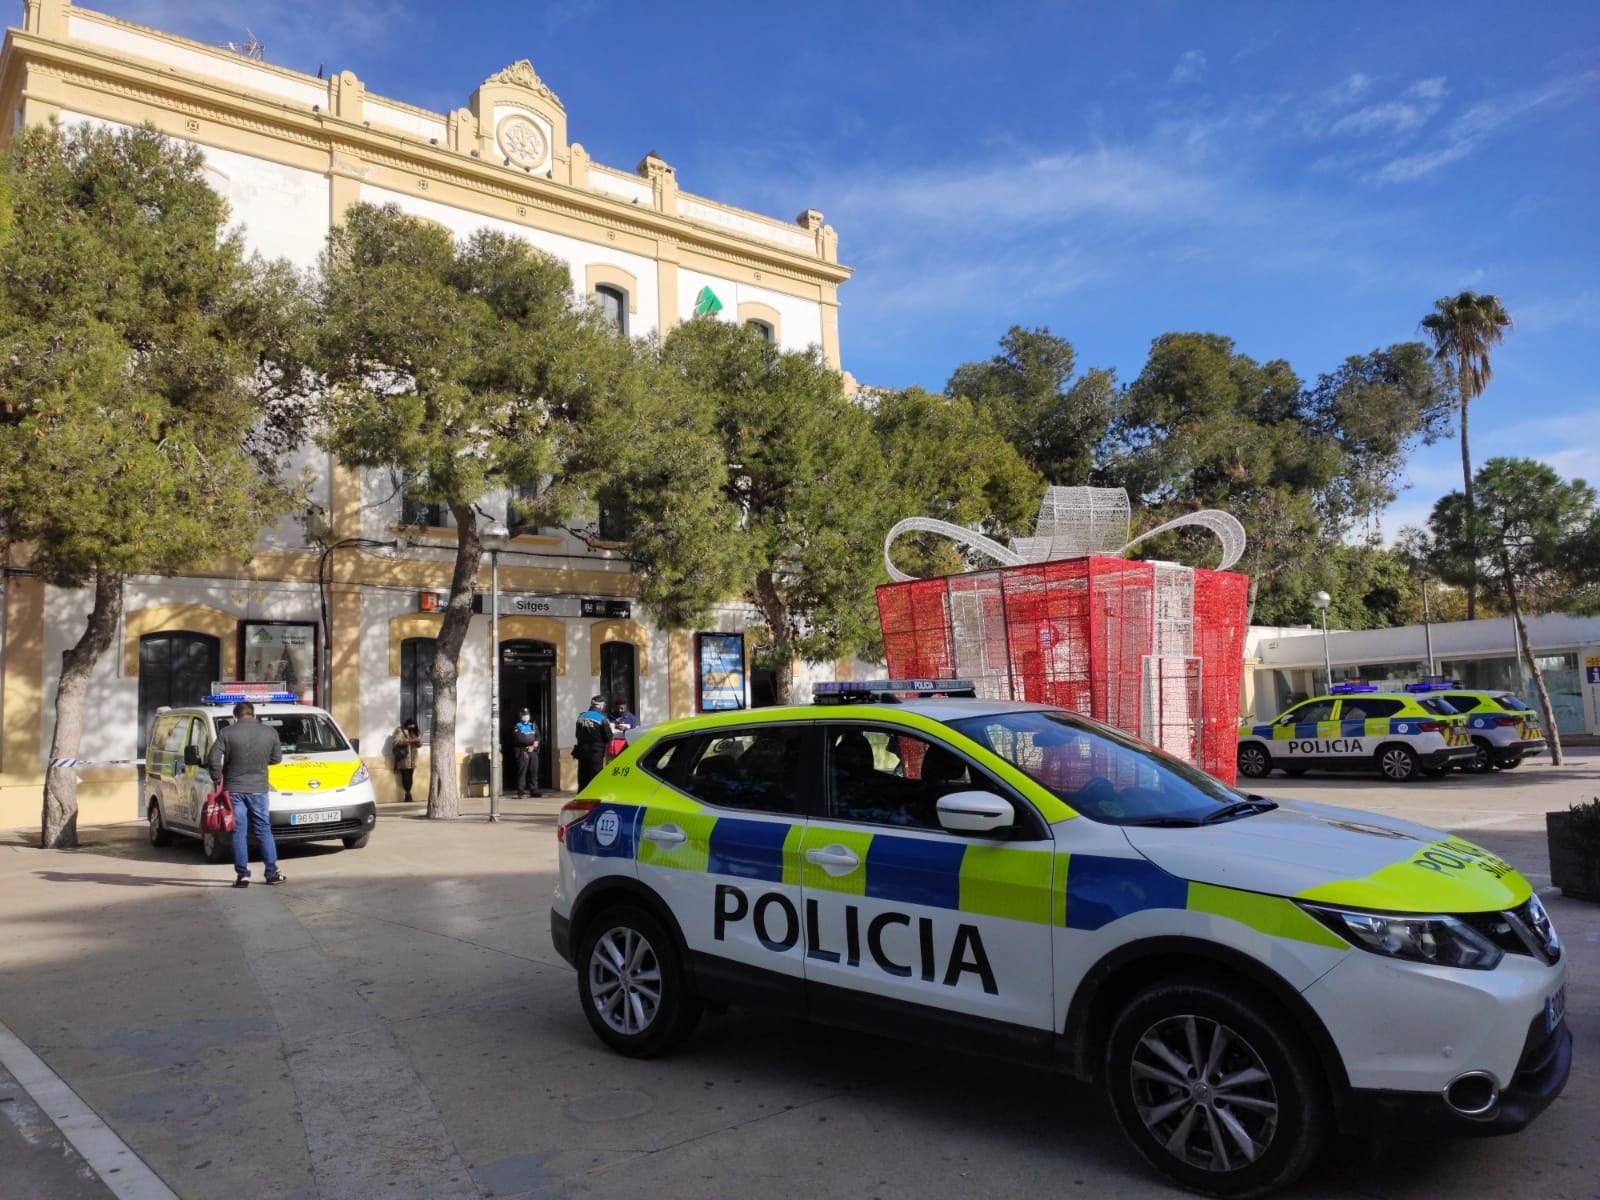 La Policia local imposa 64 sancions per incomplir normatives contra la COVID19